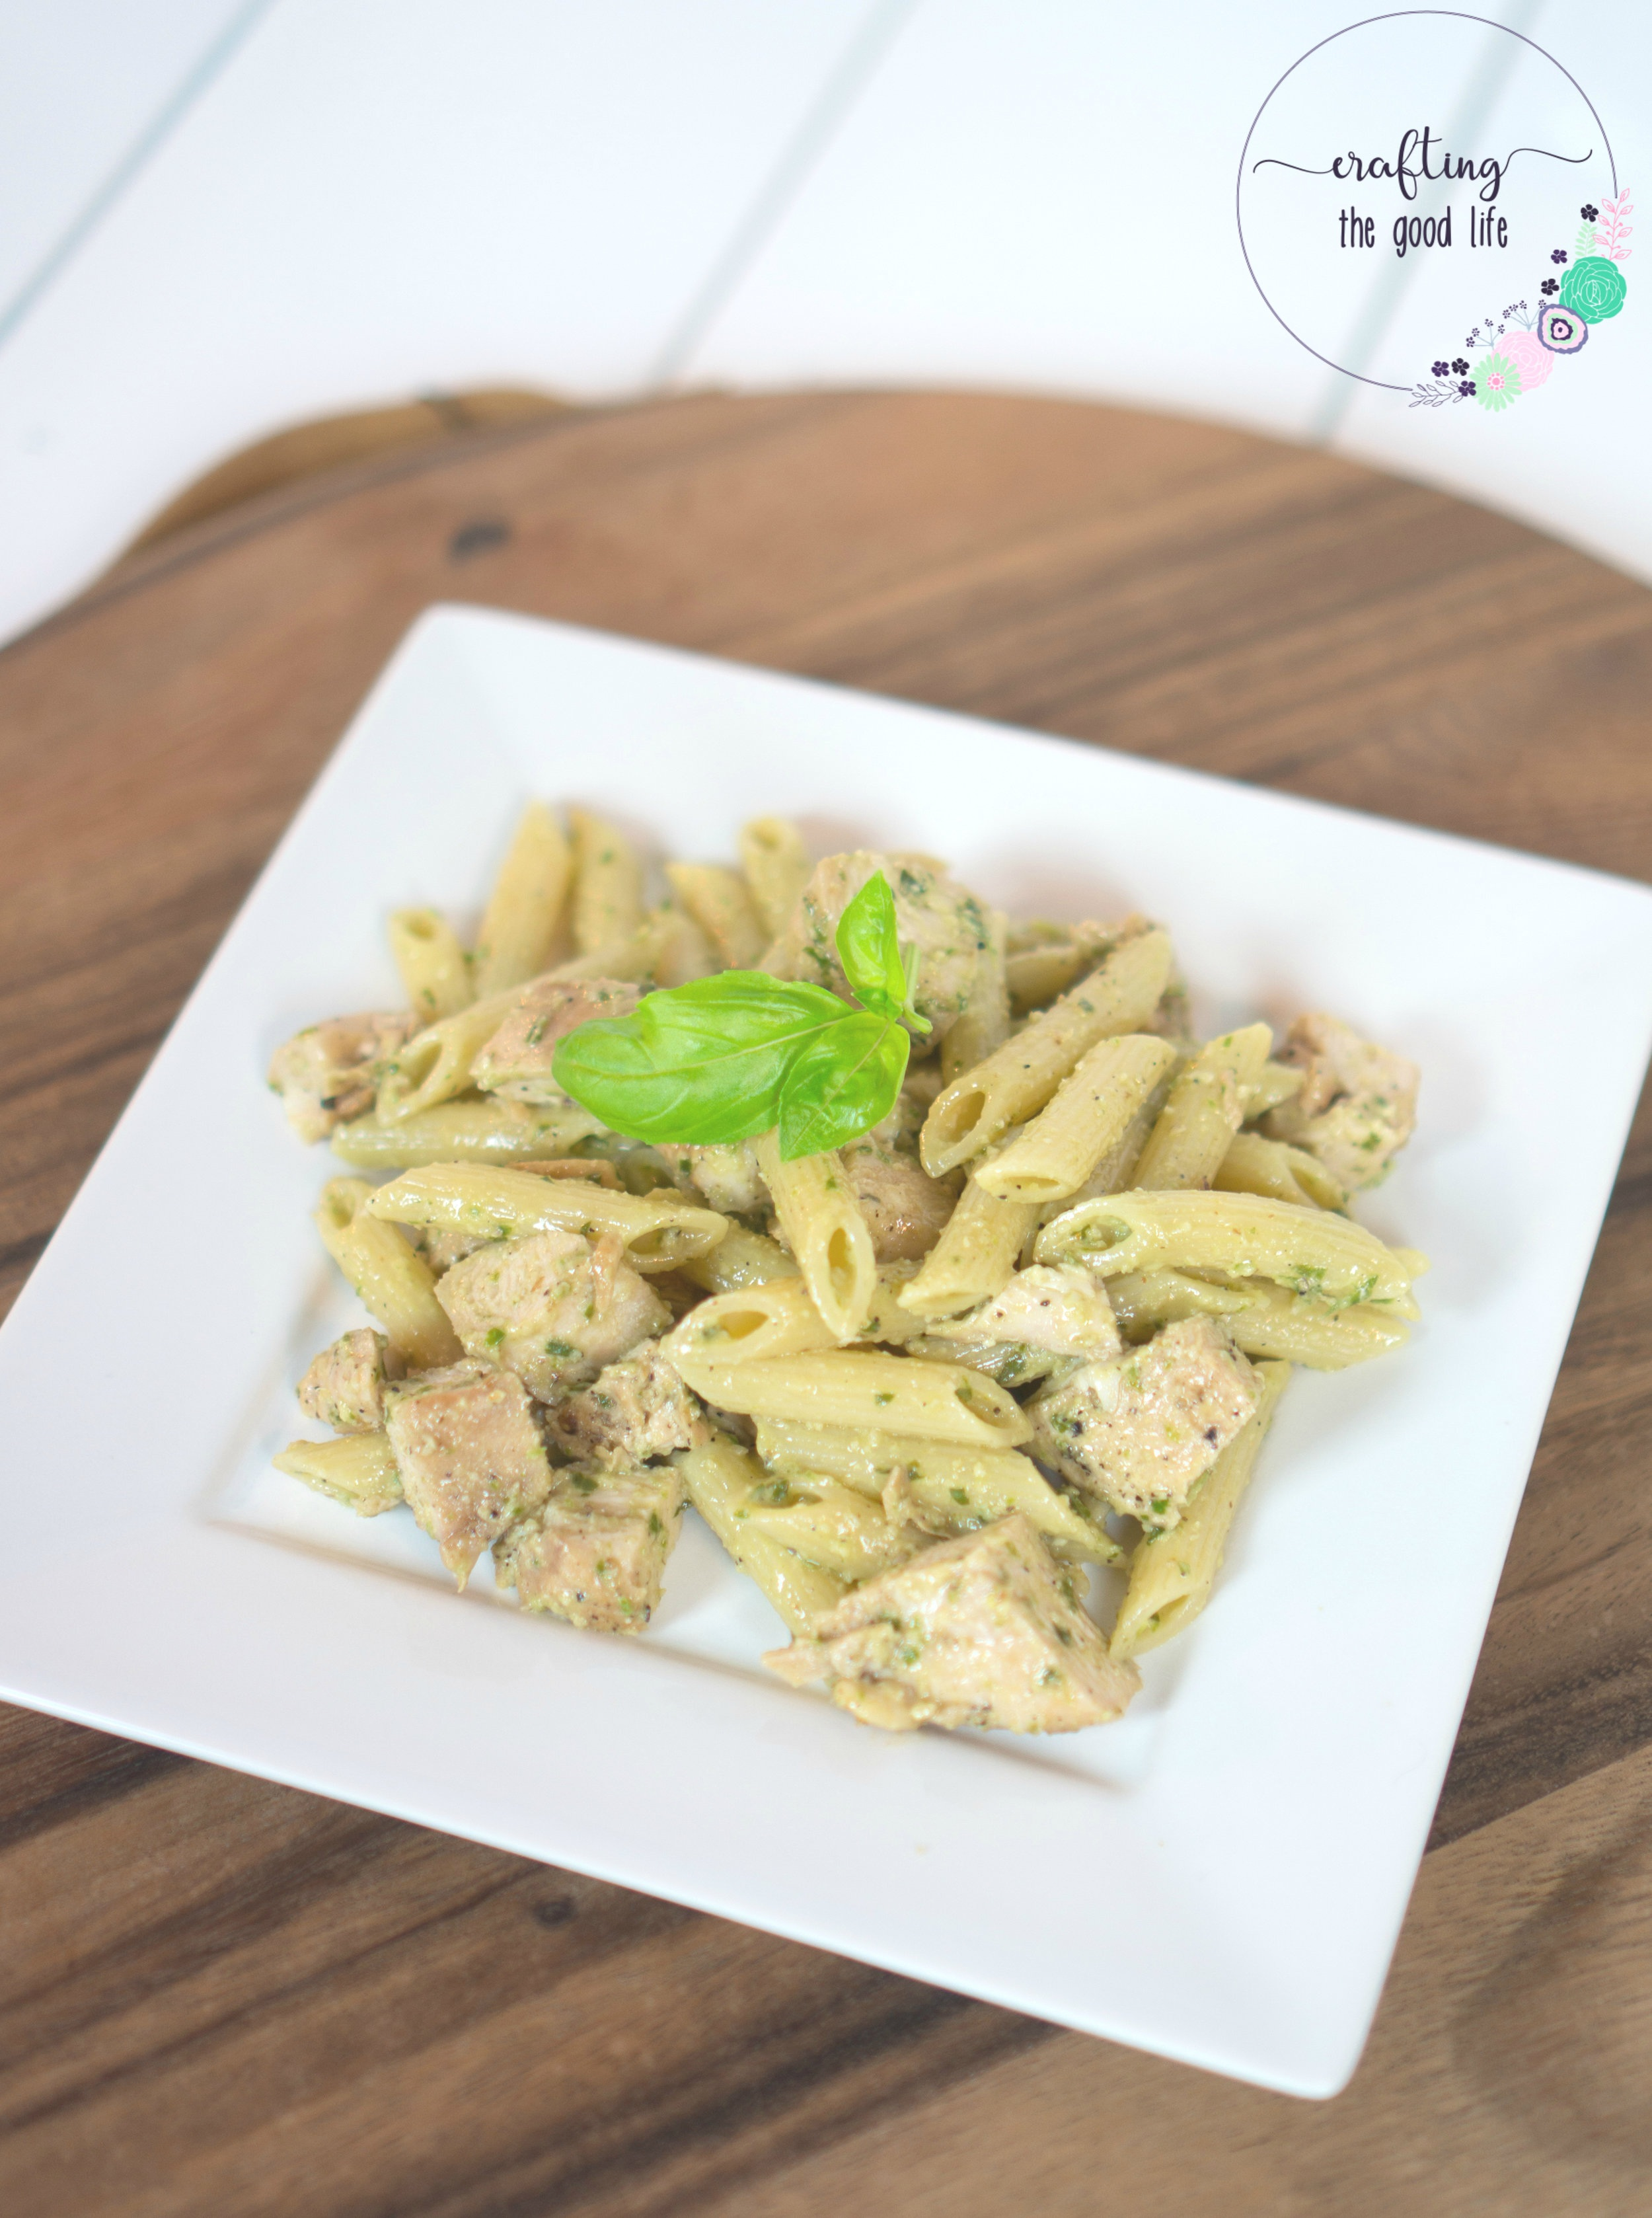 Chicken+Pasta+with+Homemade+Pesto